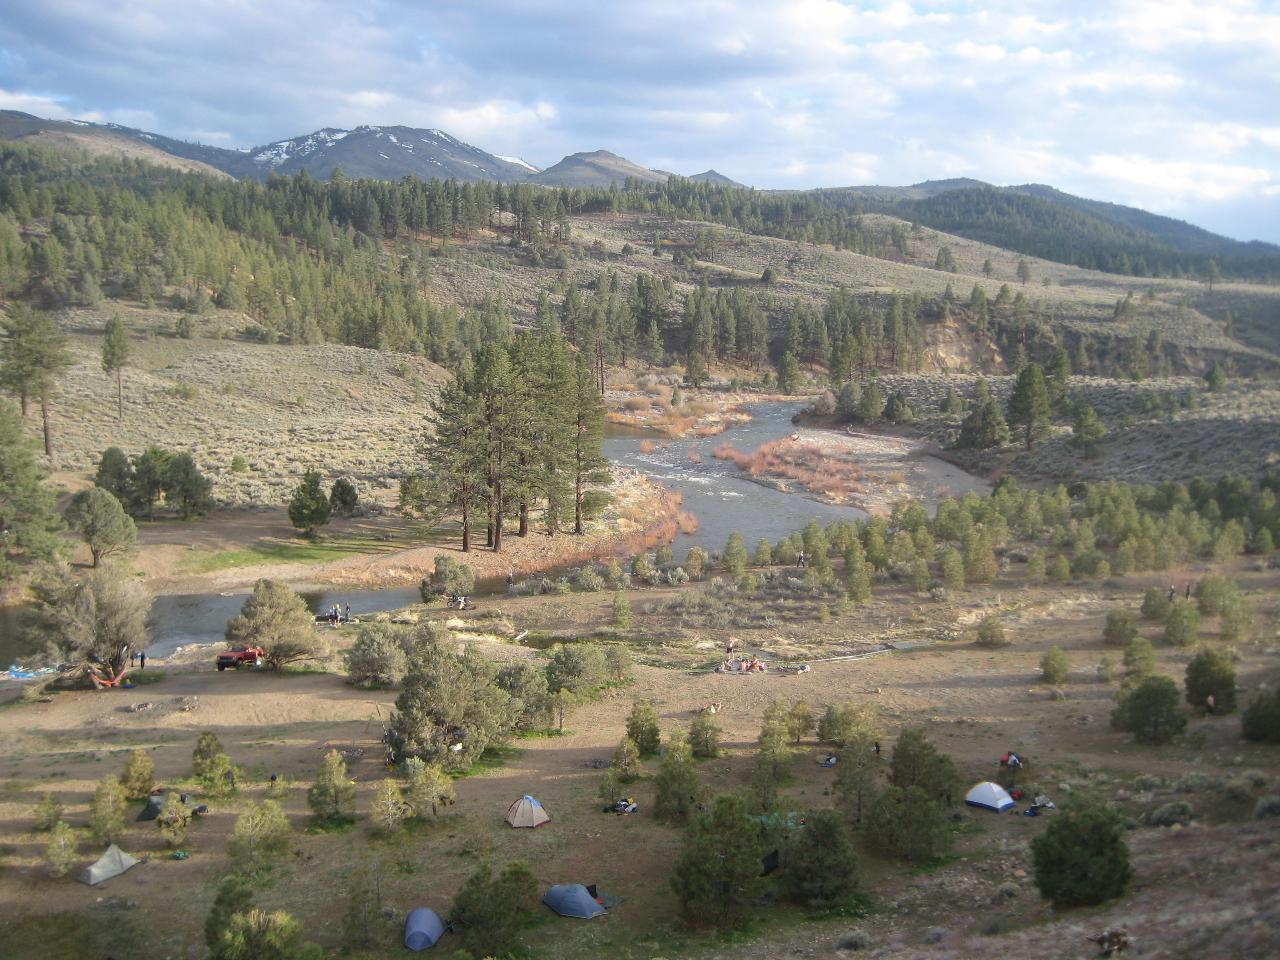 Carson River 2 Day Rafting Trip (Class II)